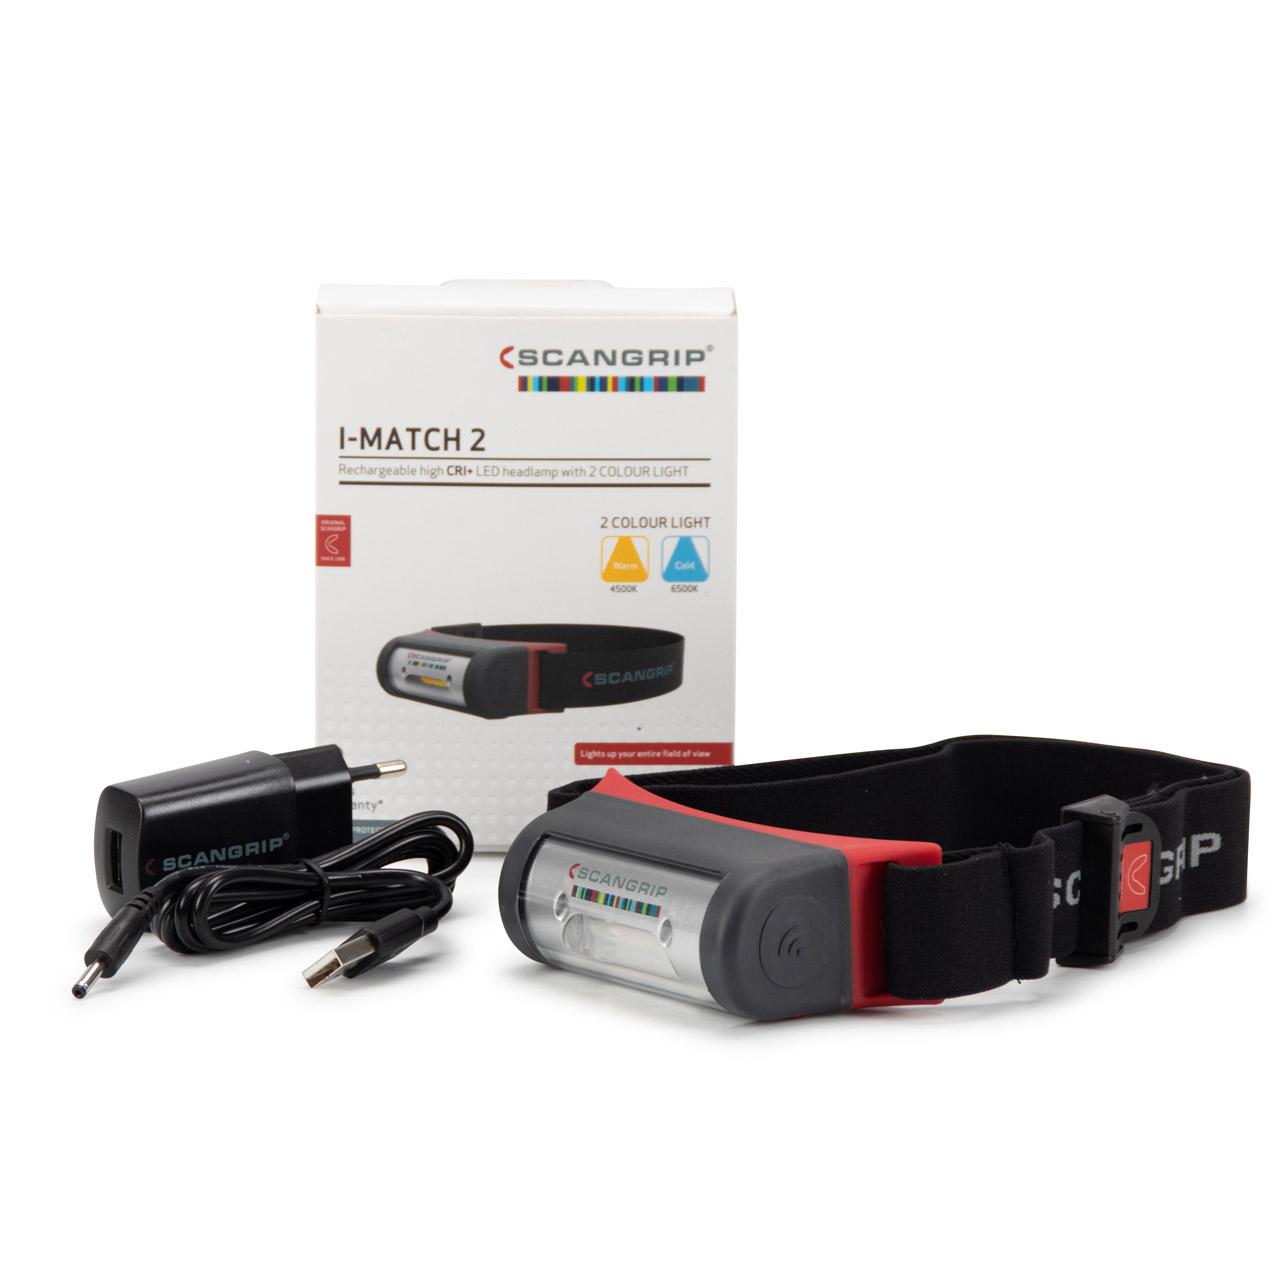 SCANGRIP I-Match 2 Akku COB-LED Sensor Kopflampe Stirnlampe Arbeitsleuchte